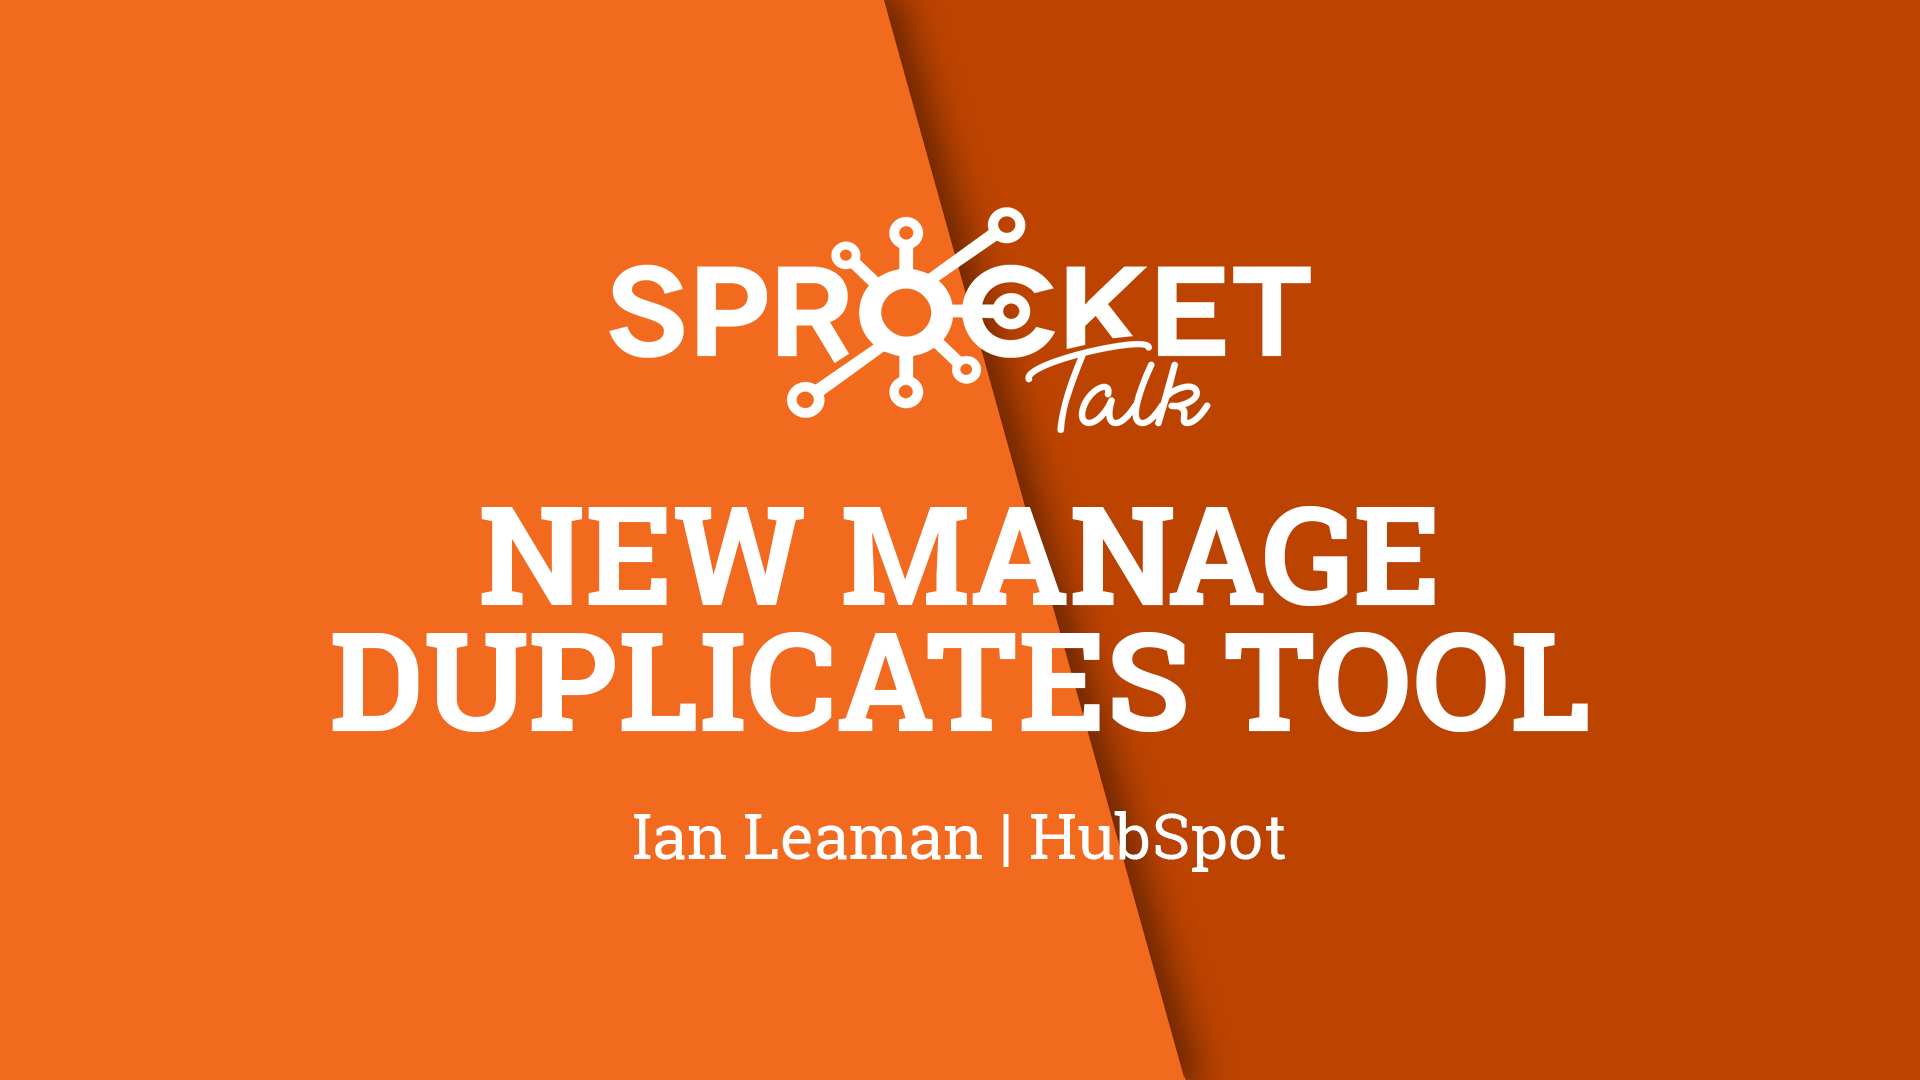 Ian Leaman | HubSpot